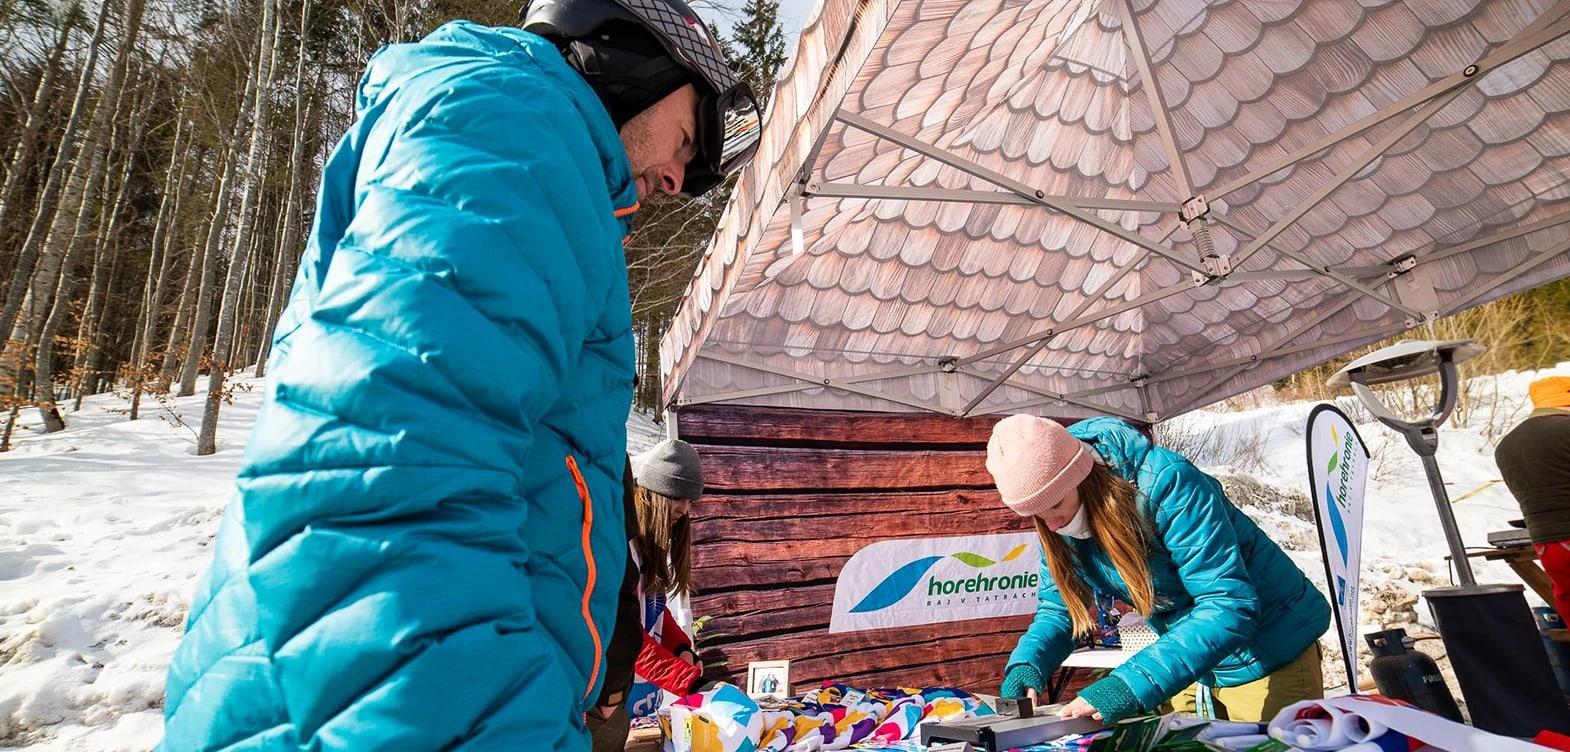 gazebo skiing promotional tent with print  gazebo pop up